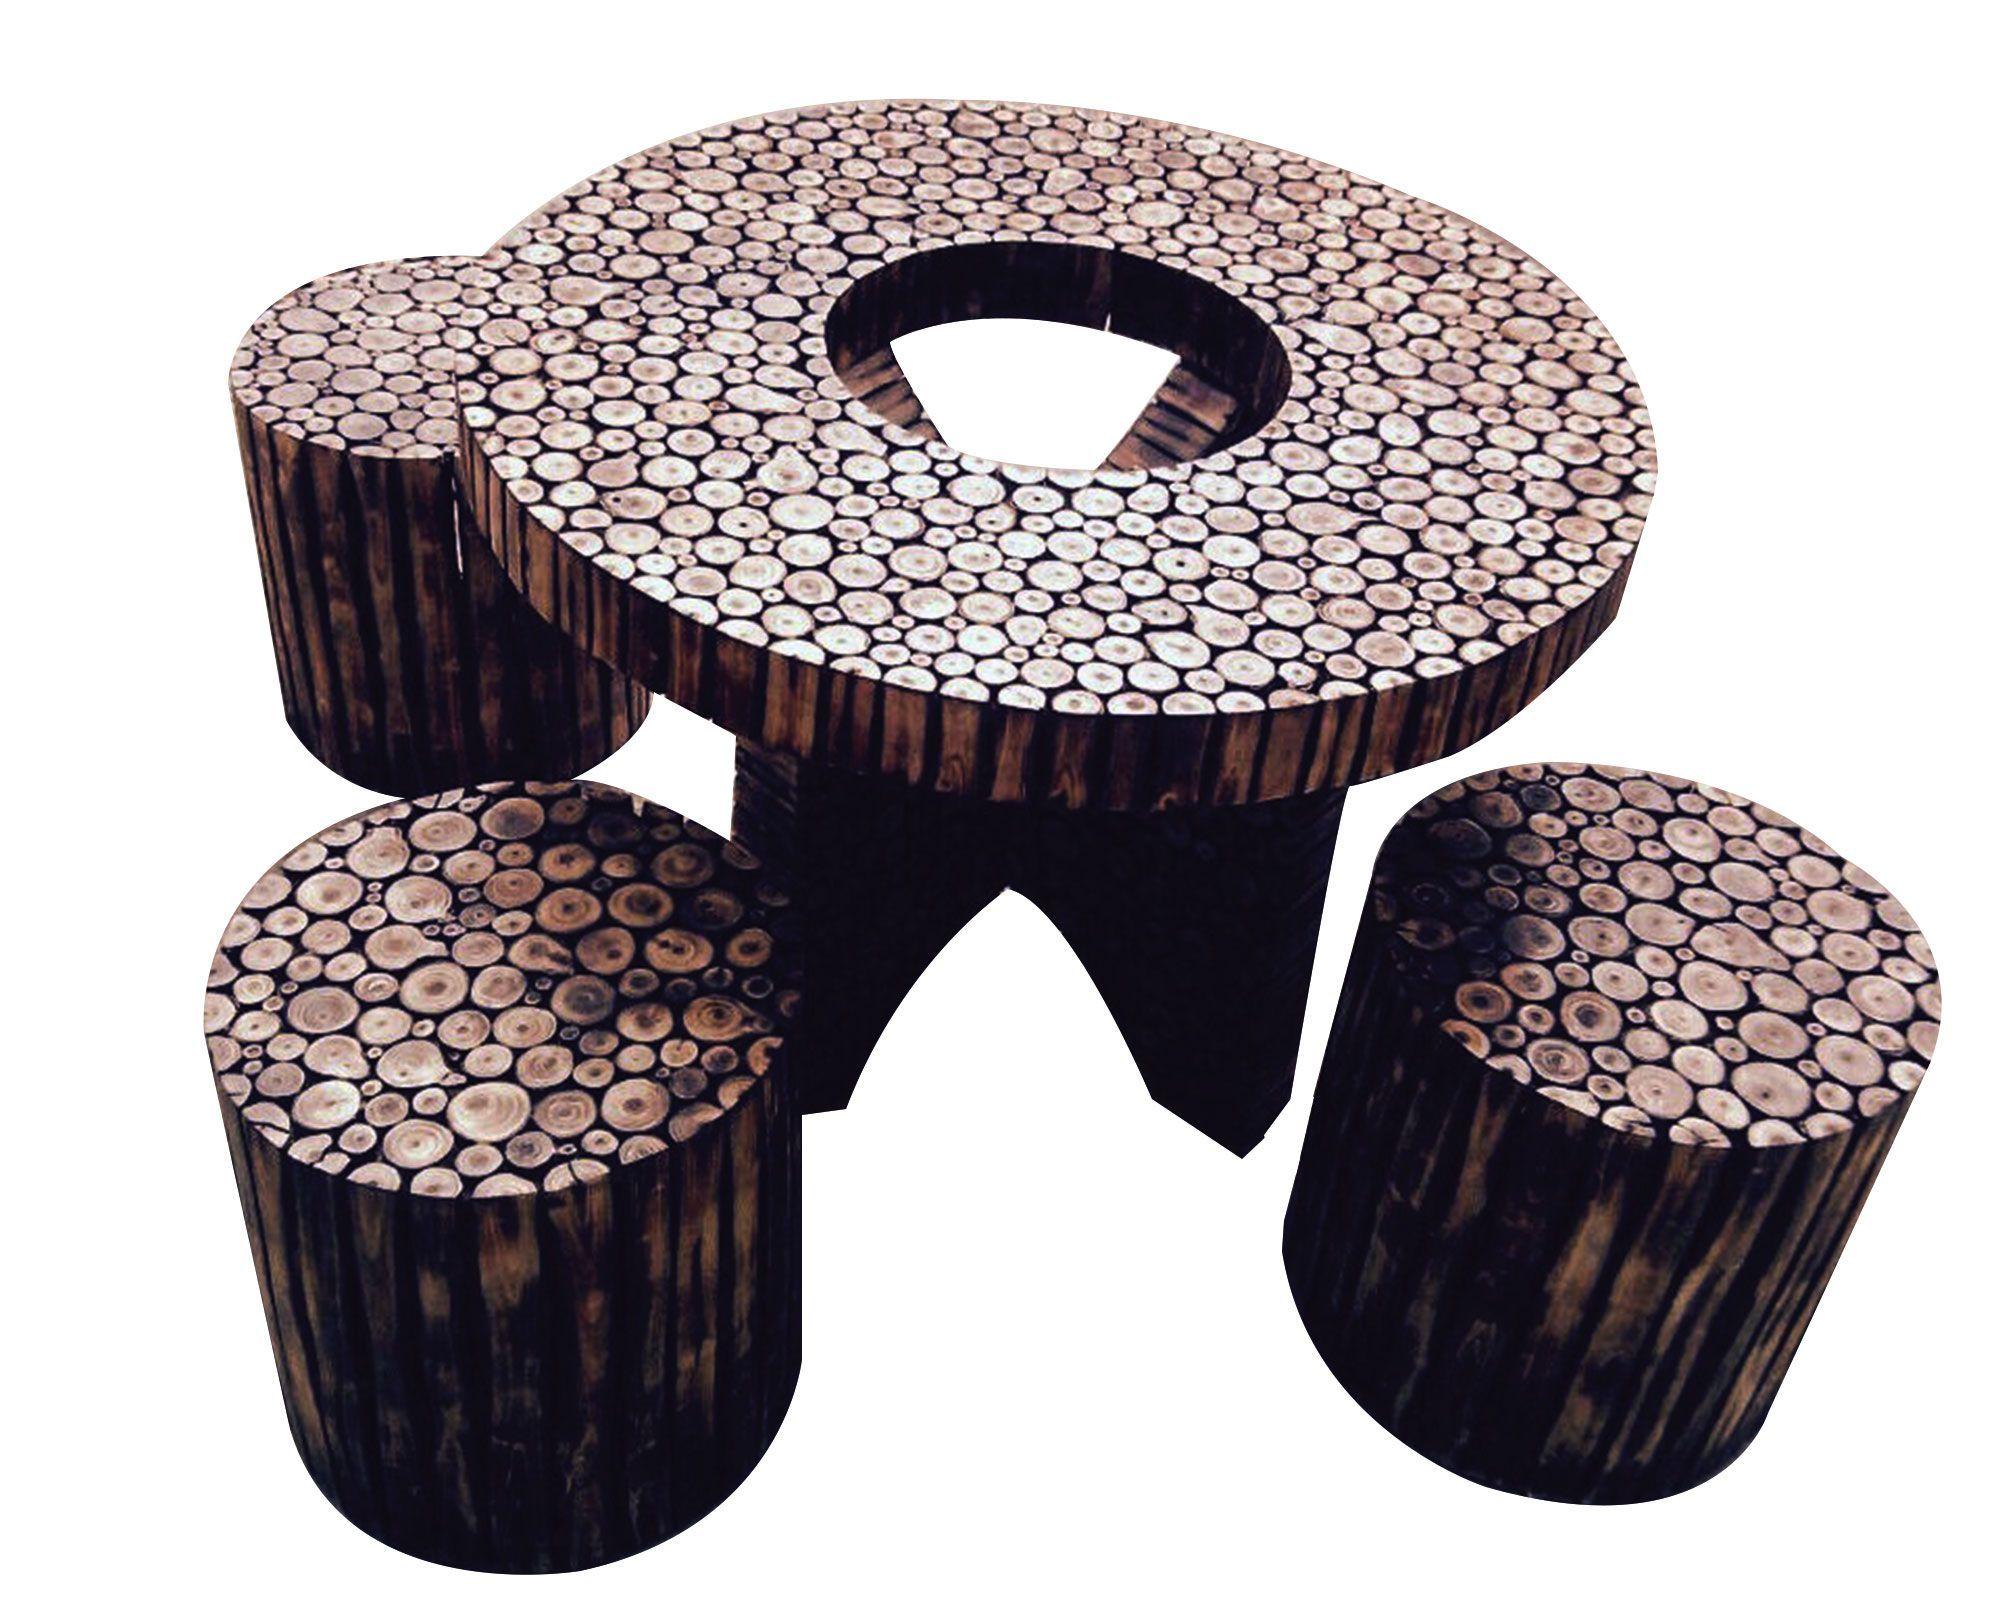 wooden handmade furniture - hm16